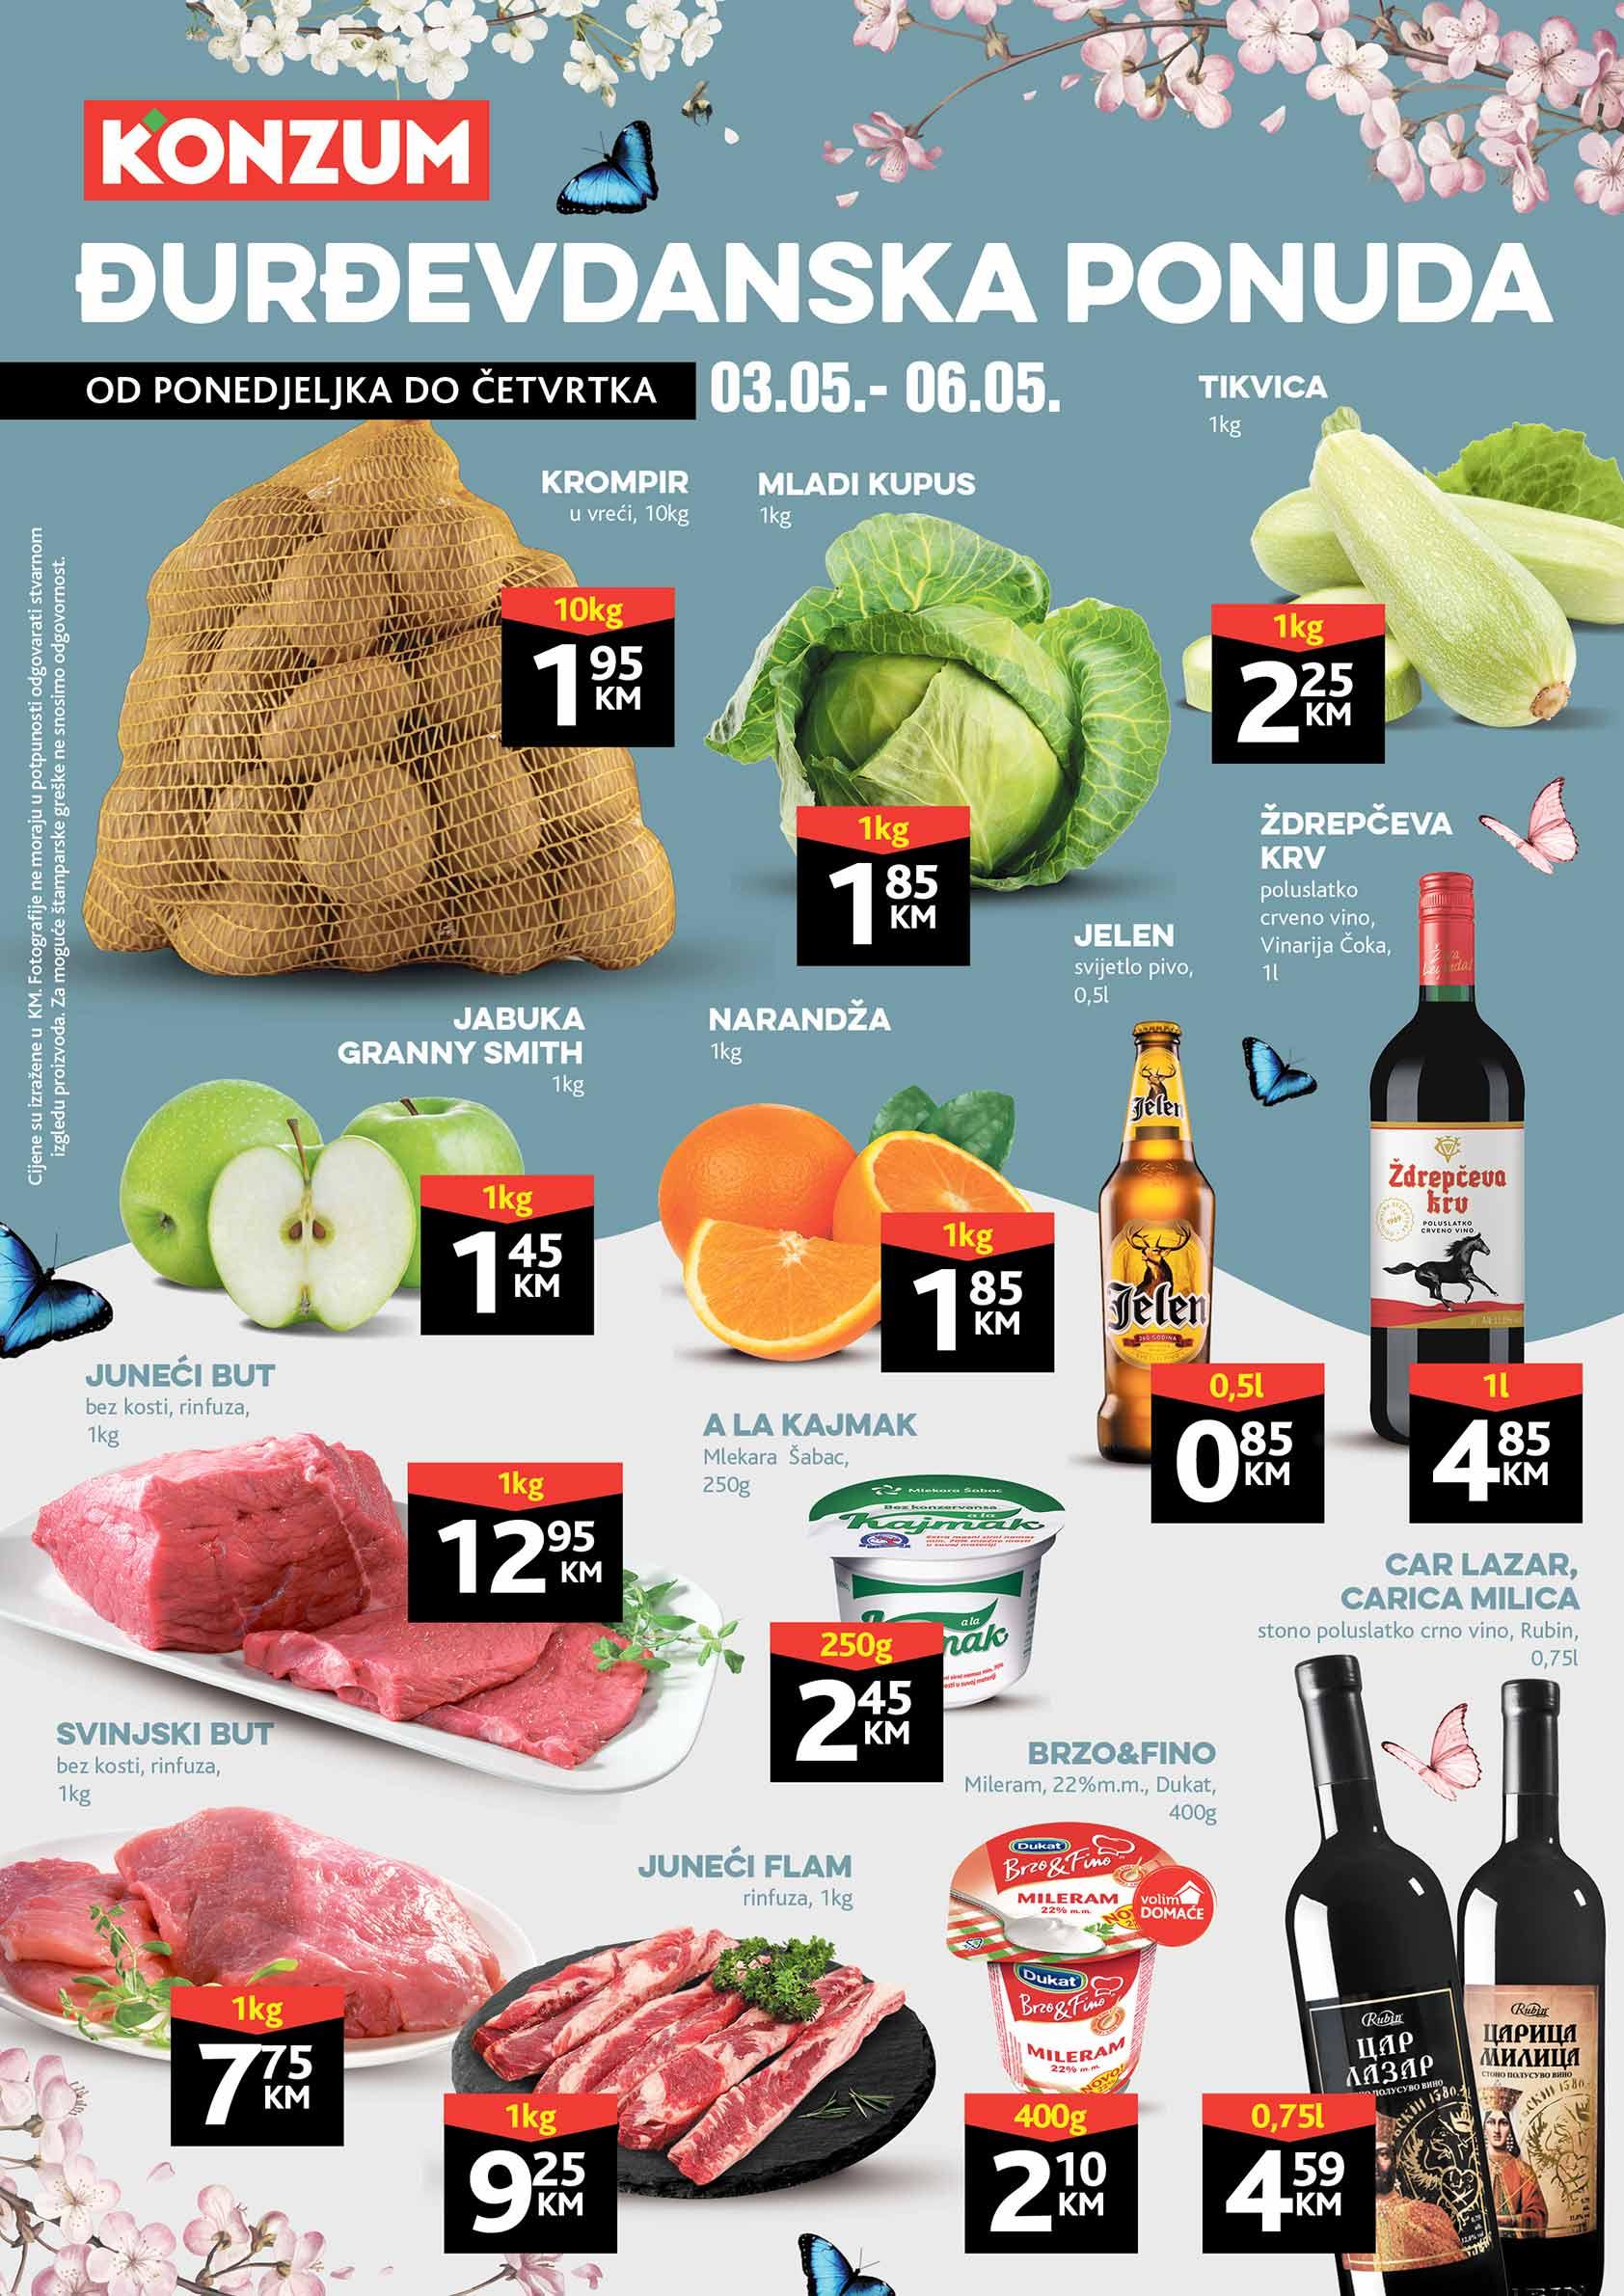 KONZUM Katalog DJurdjevdanska ponuda MAJ 2021 03.05.2021. 05.05.2021.